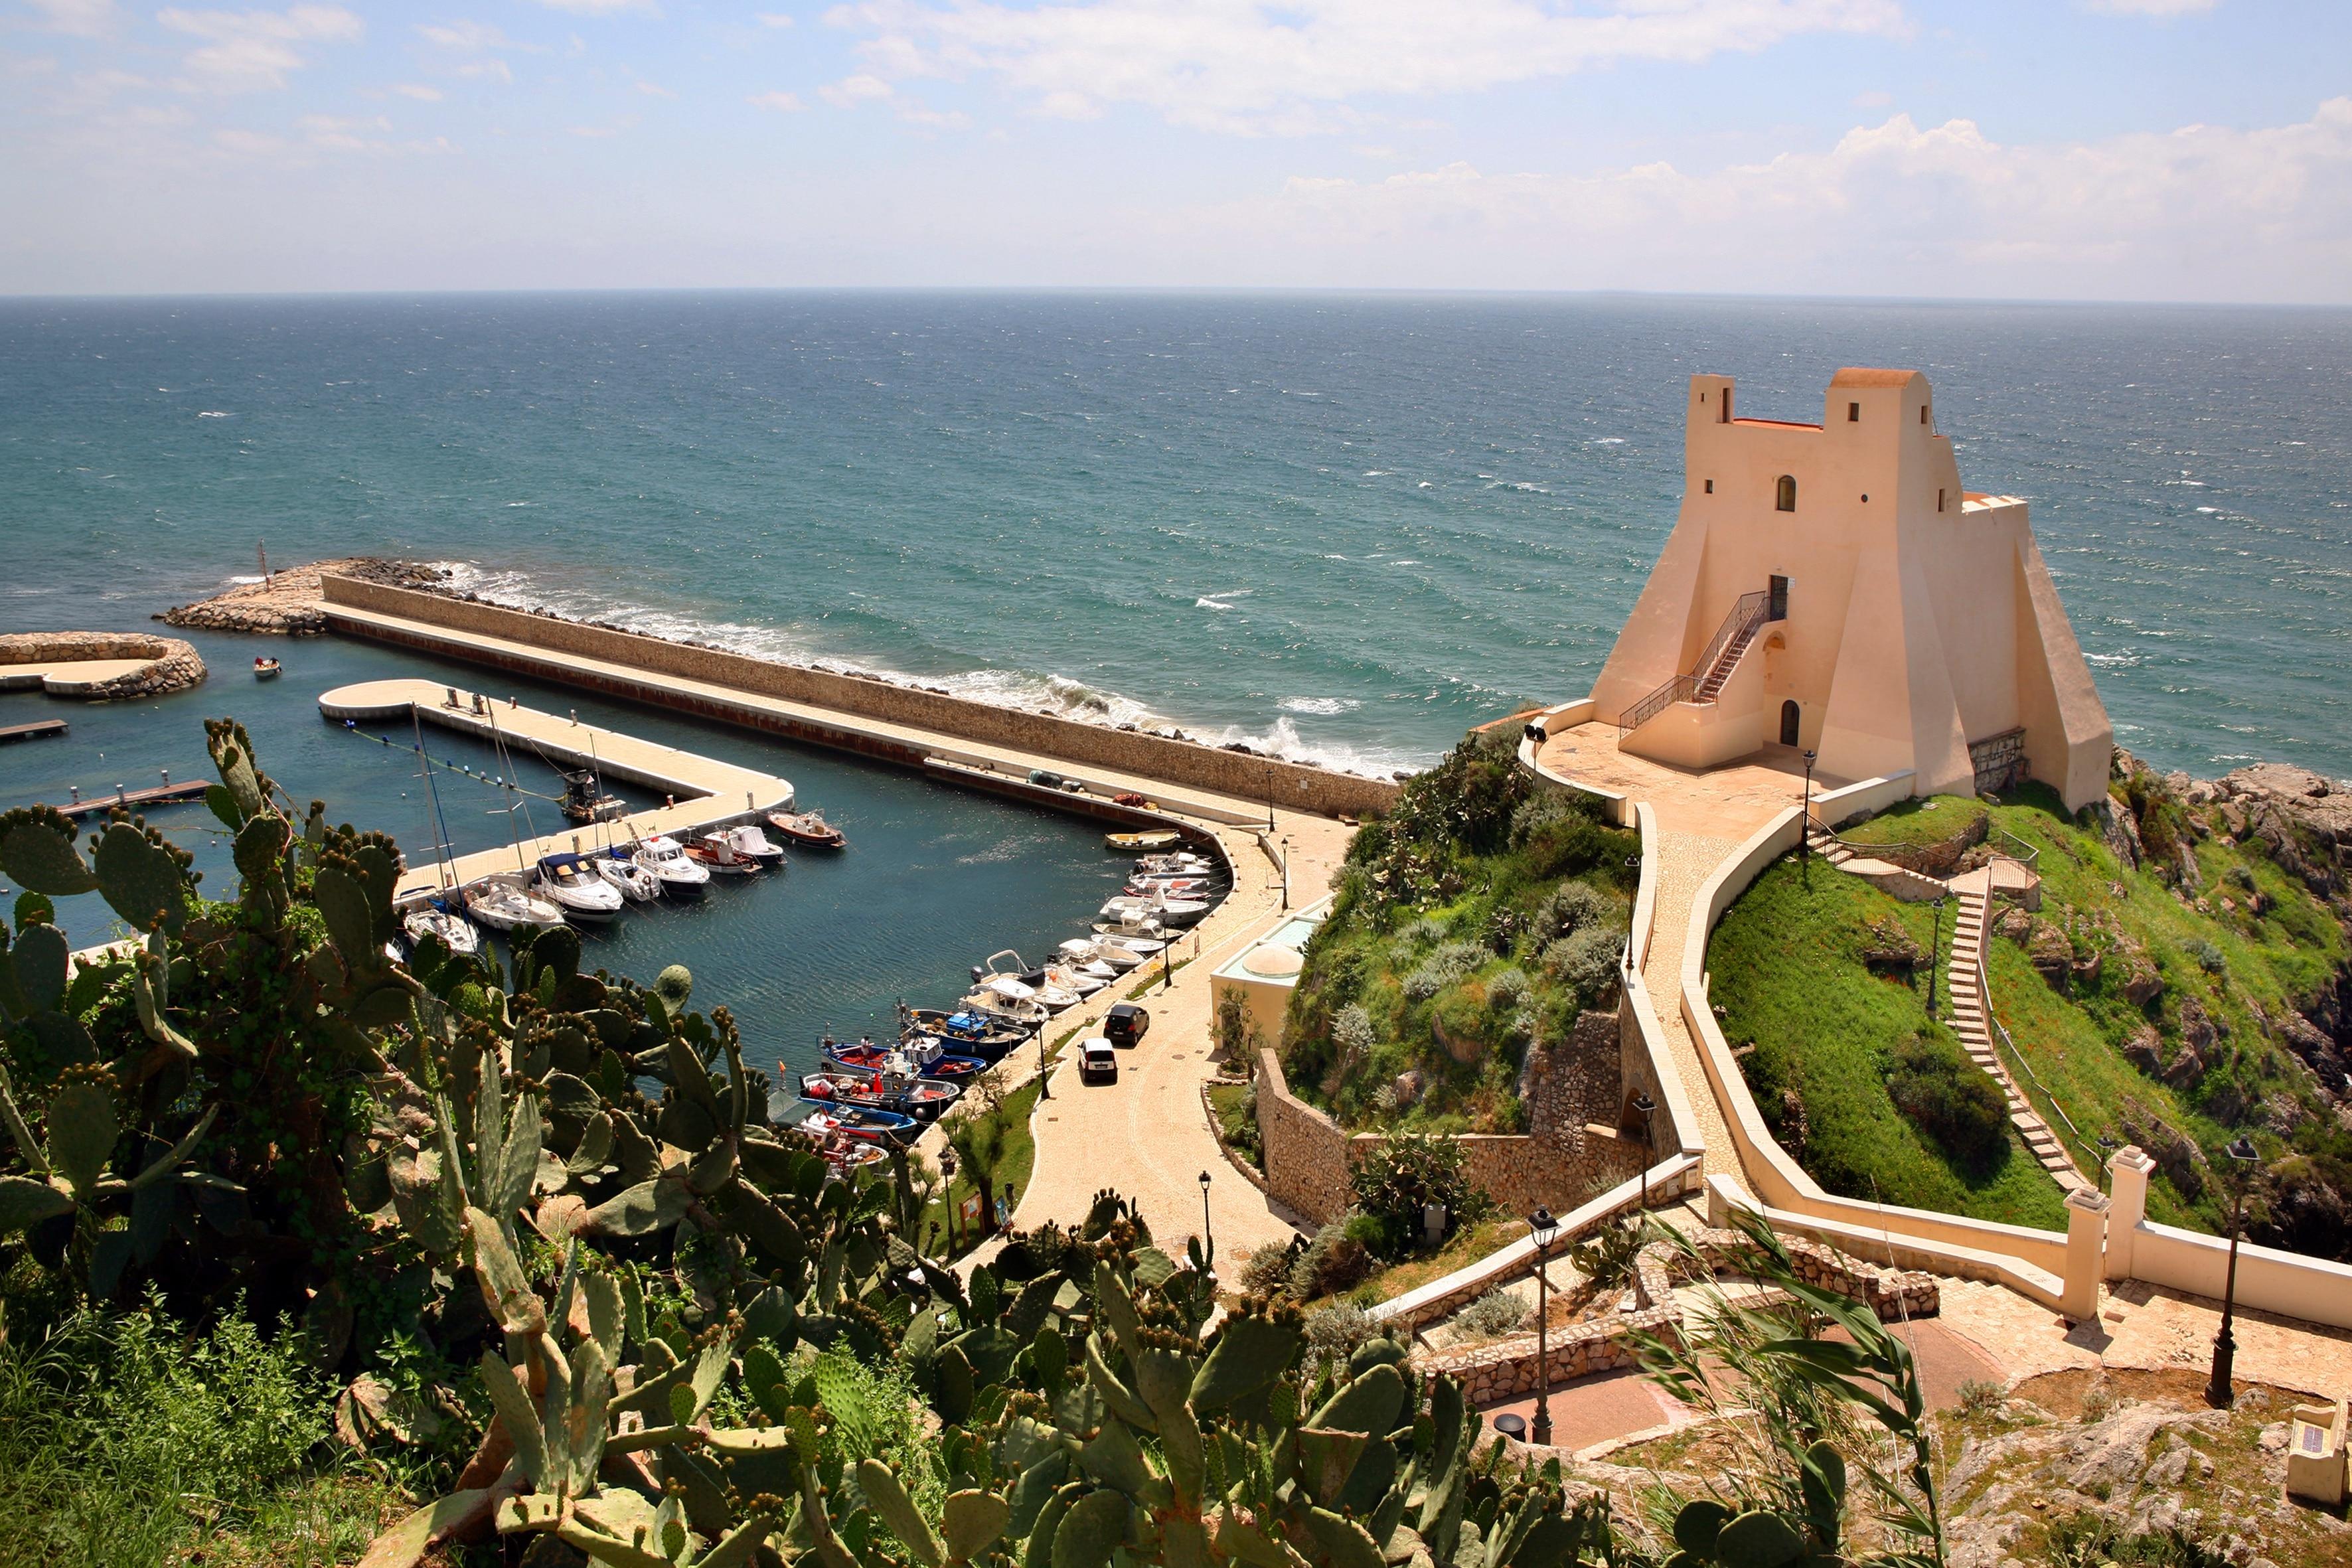 Sperlonga Port, Sperlonga, Lazio, Italy